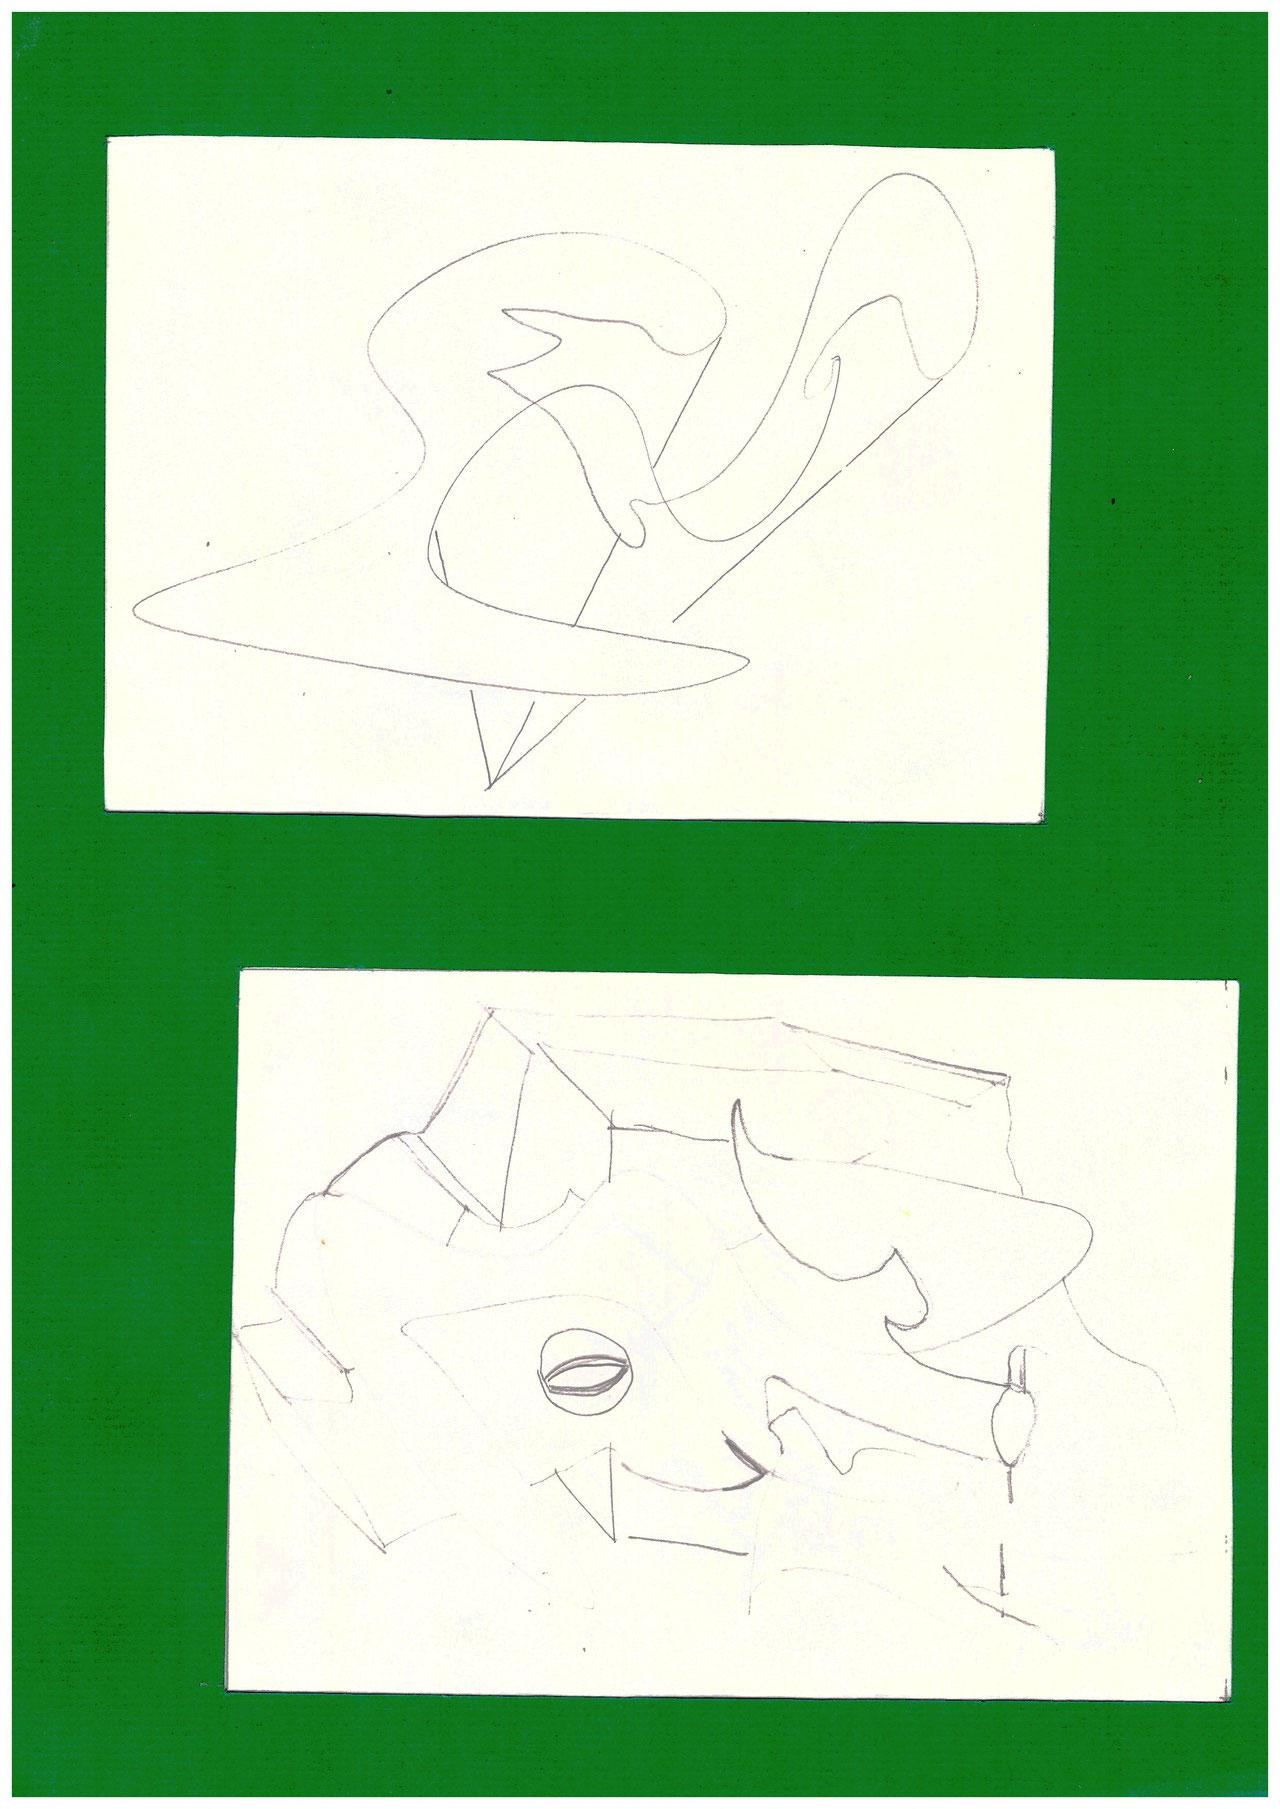 ARTeBenitez Phase 2 2011/13